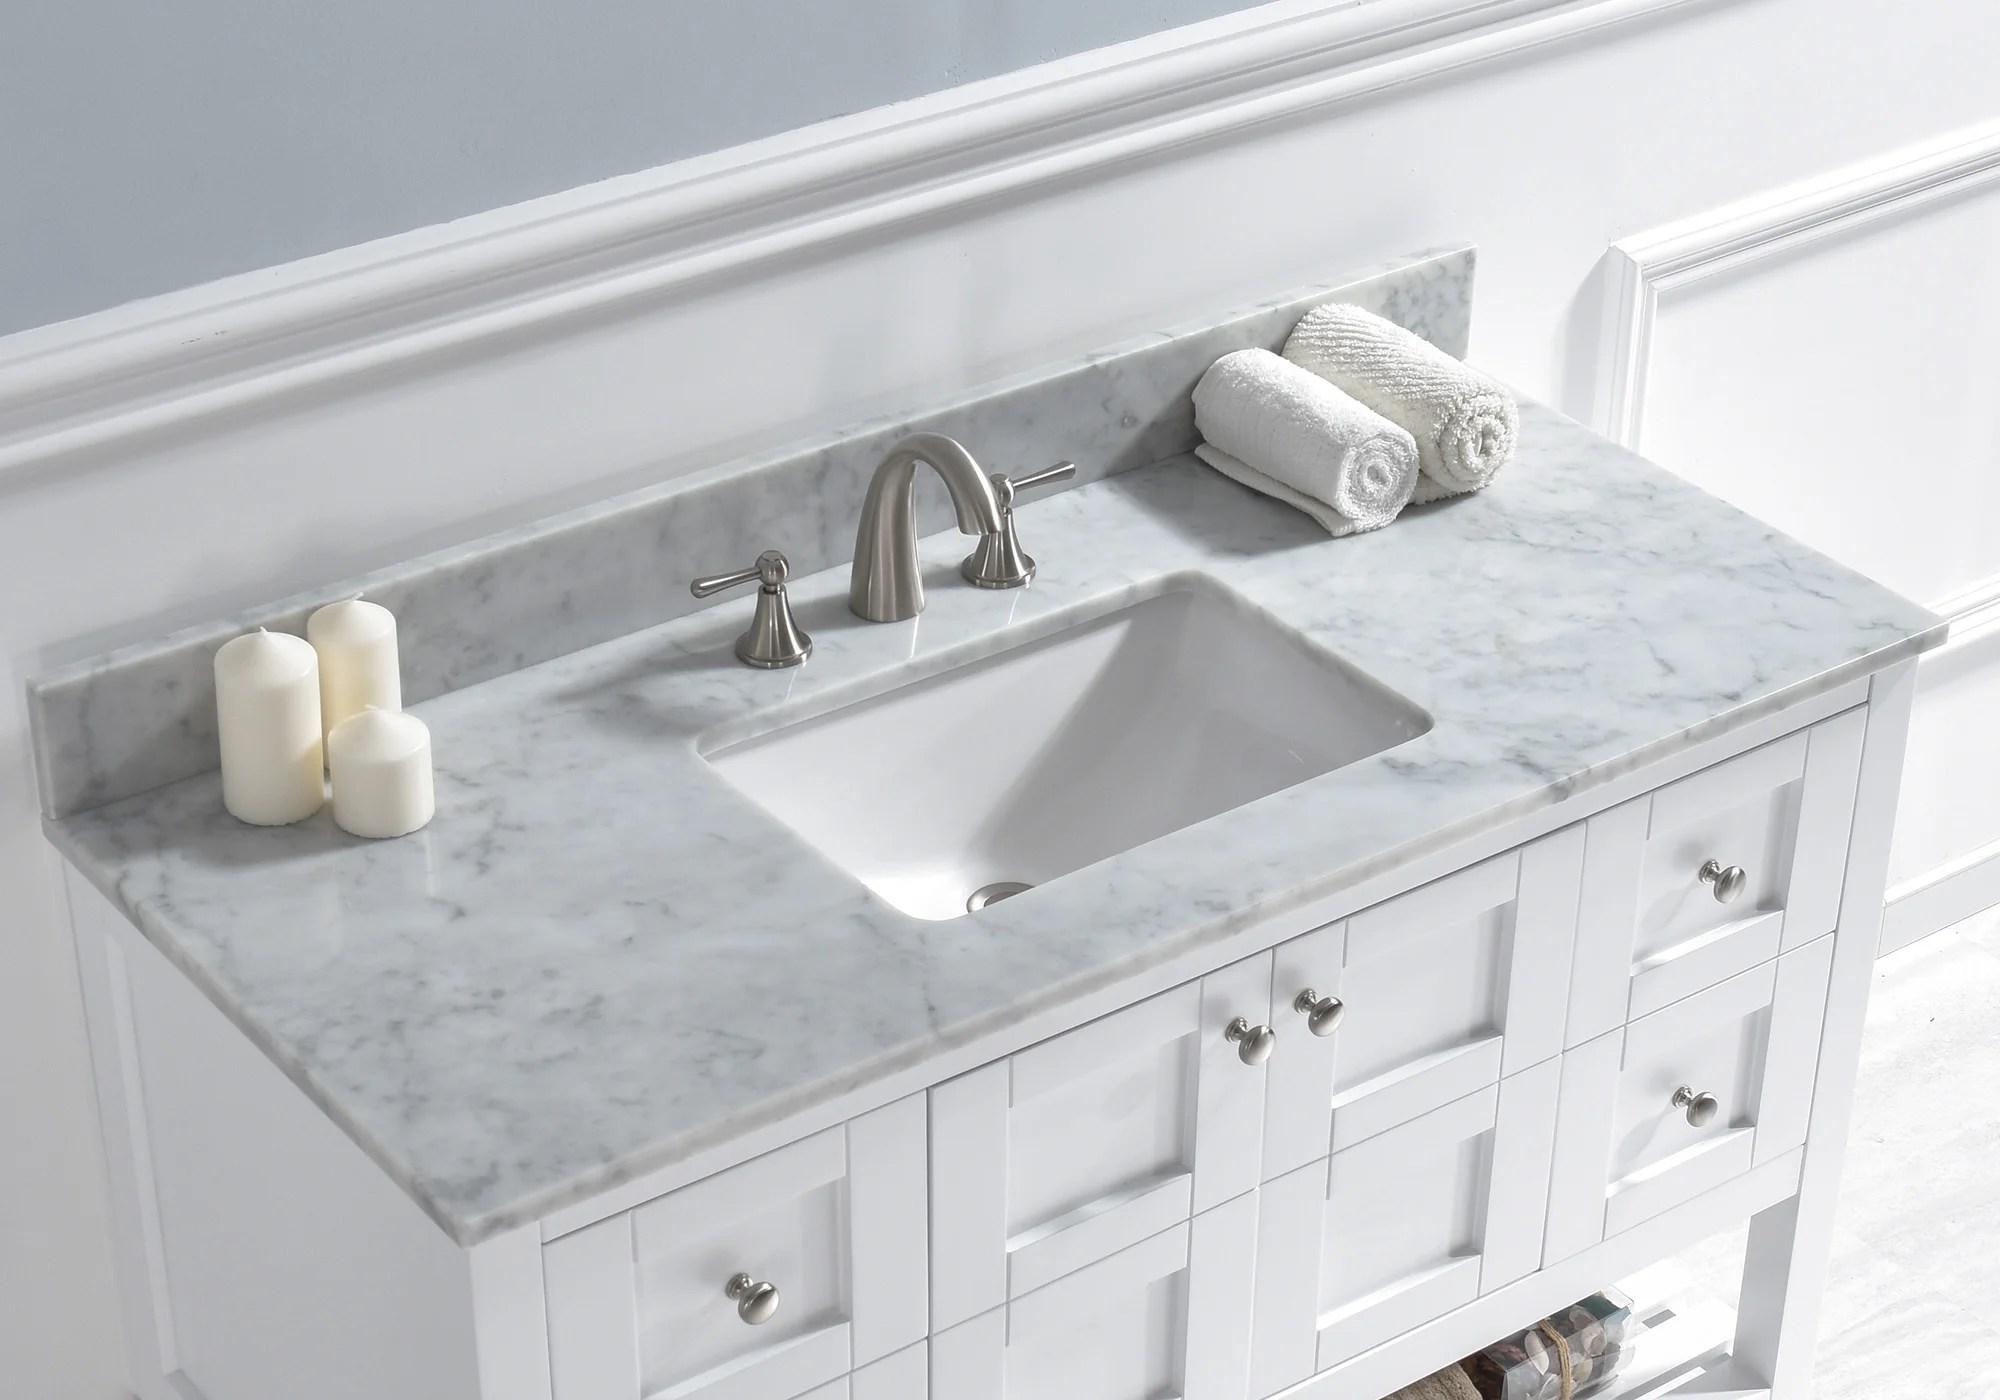 48 single bathroom vanity top in carra white with sink